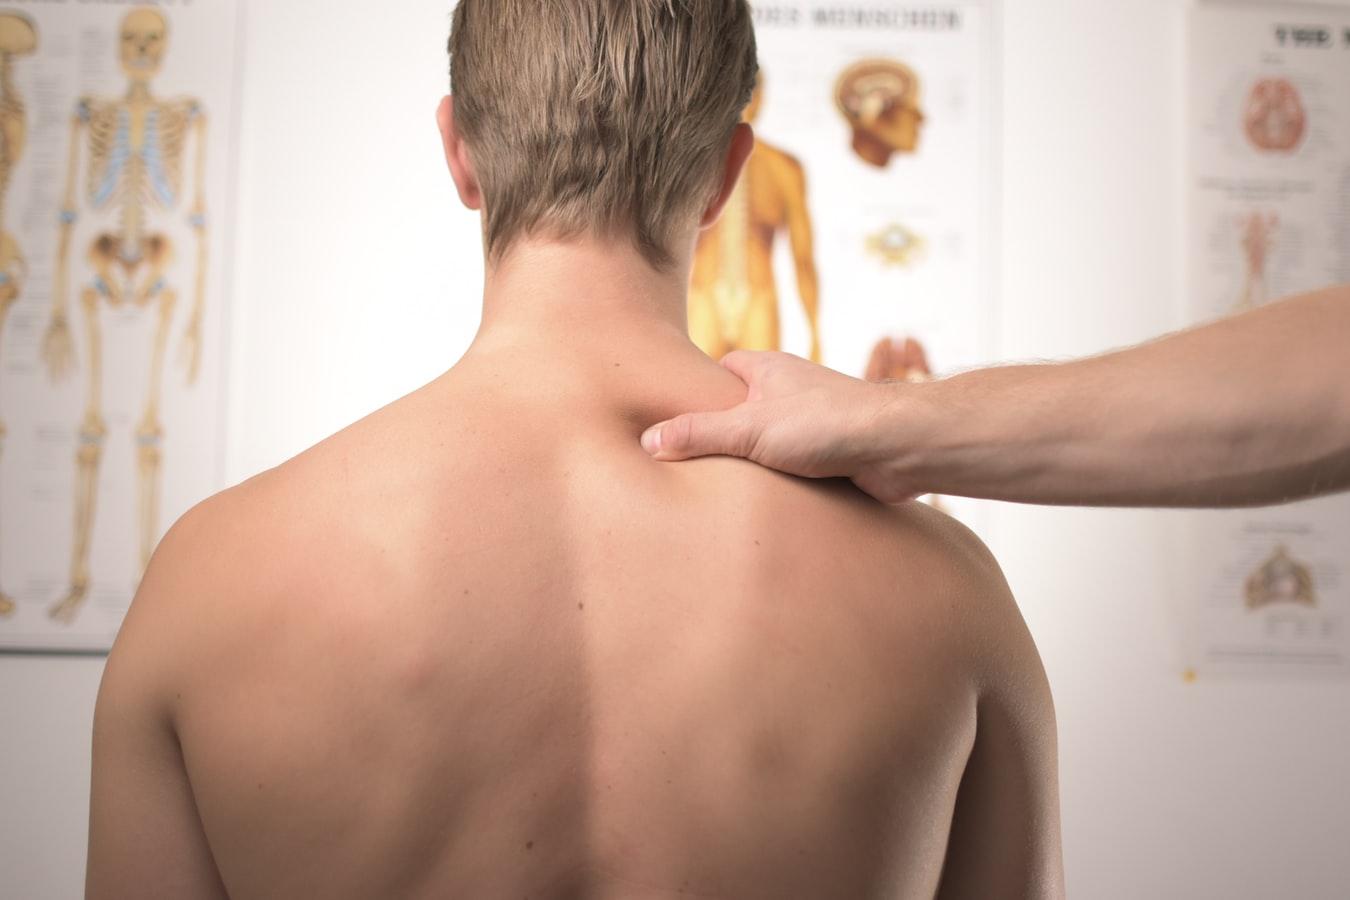 Sırt ağrısı riski altında mısınız? Rahatlamanın 25 Doğal Yolu